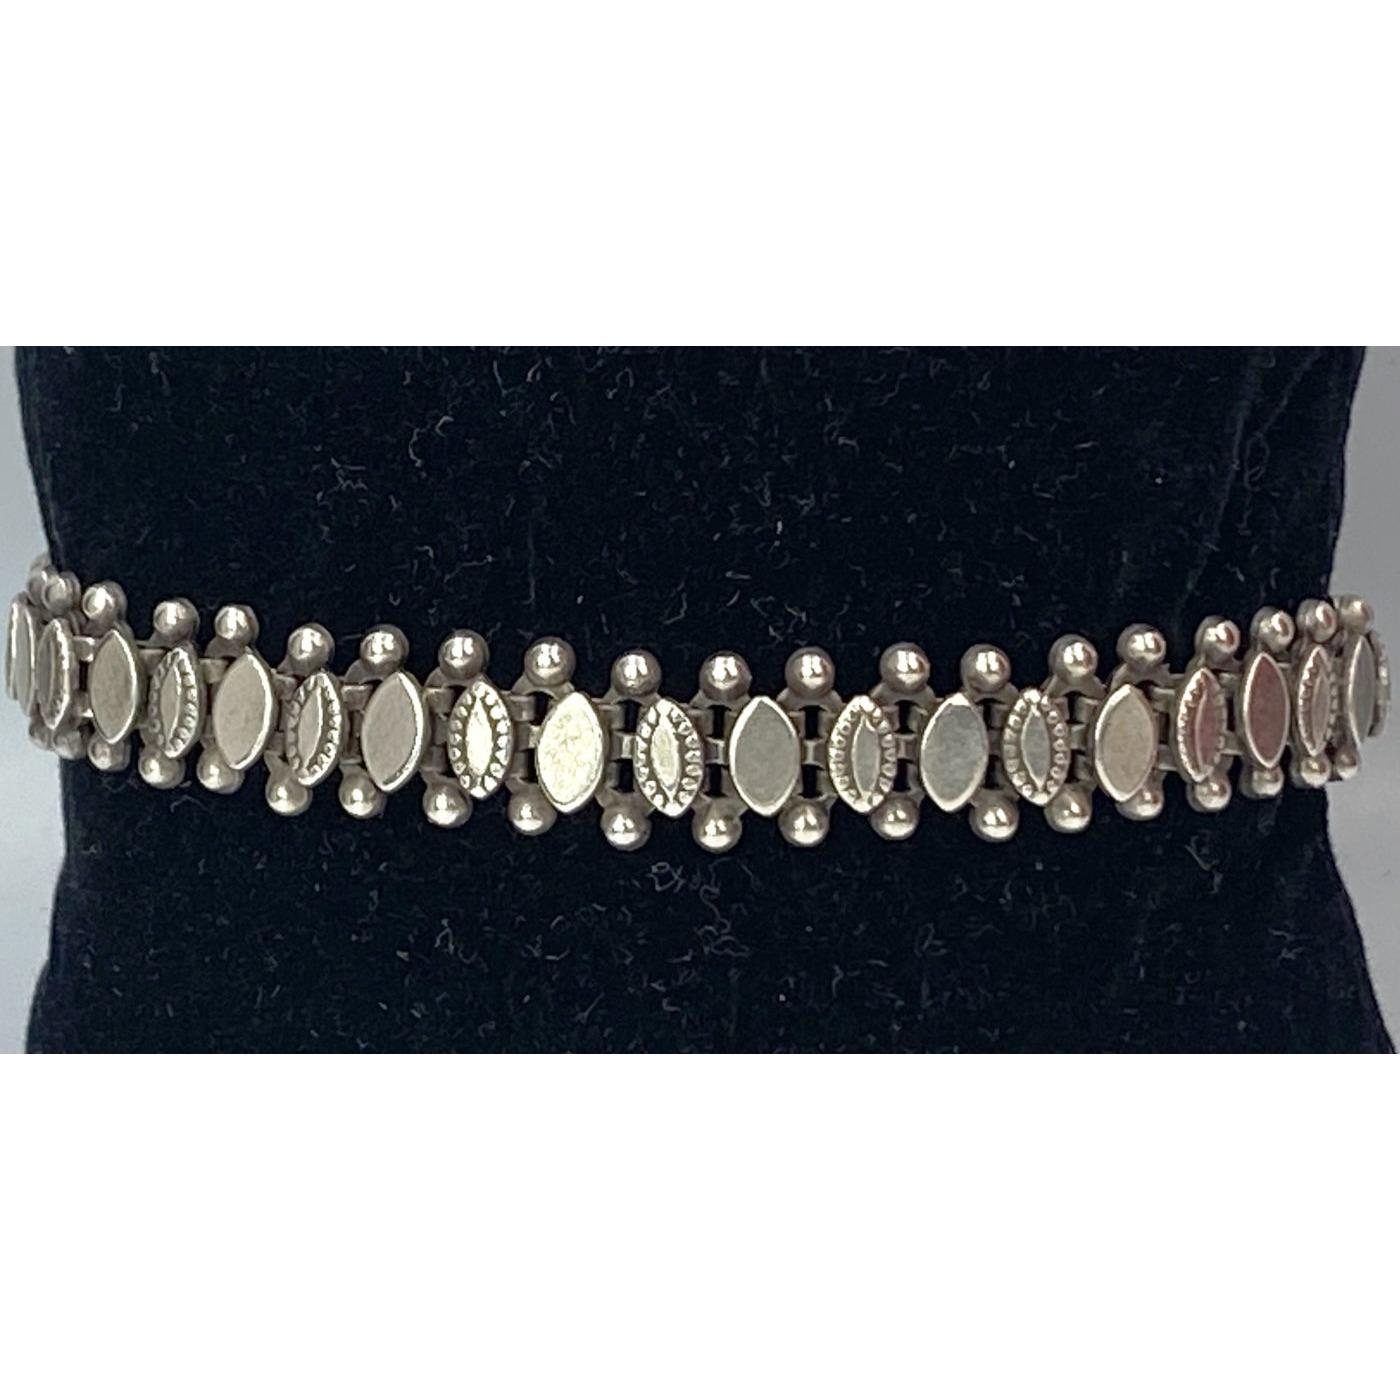 Larger Wrist Paneled Antique English Silver Bracelet